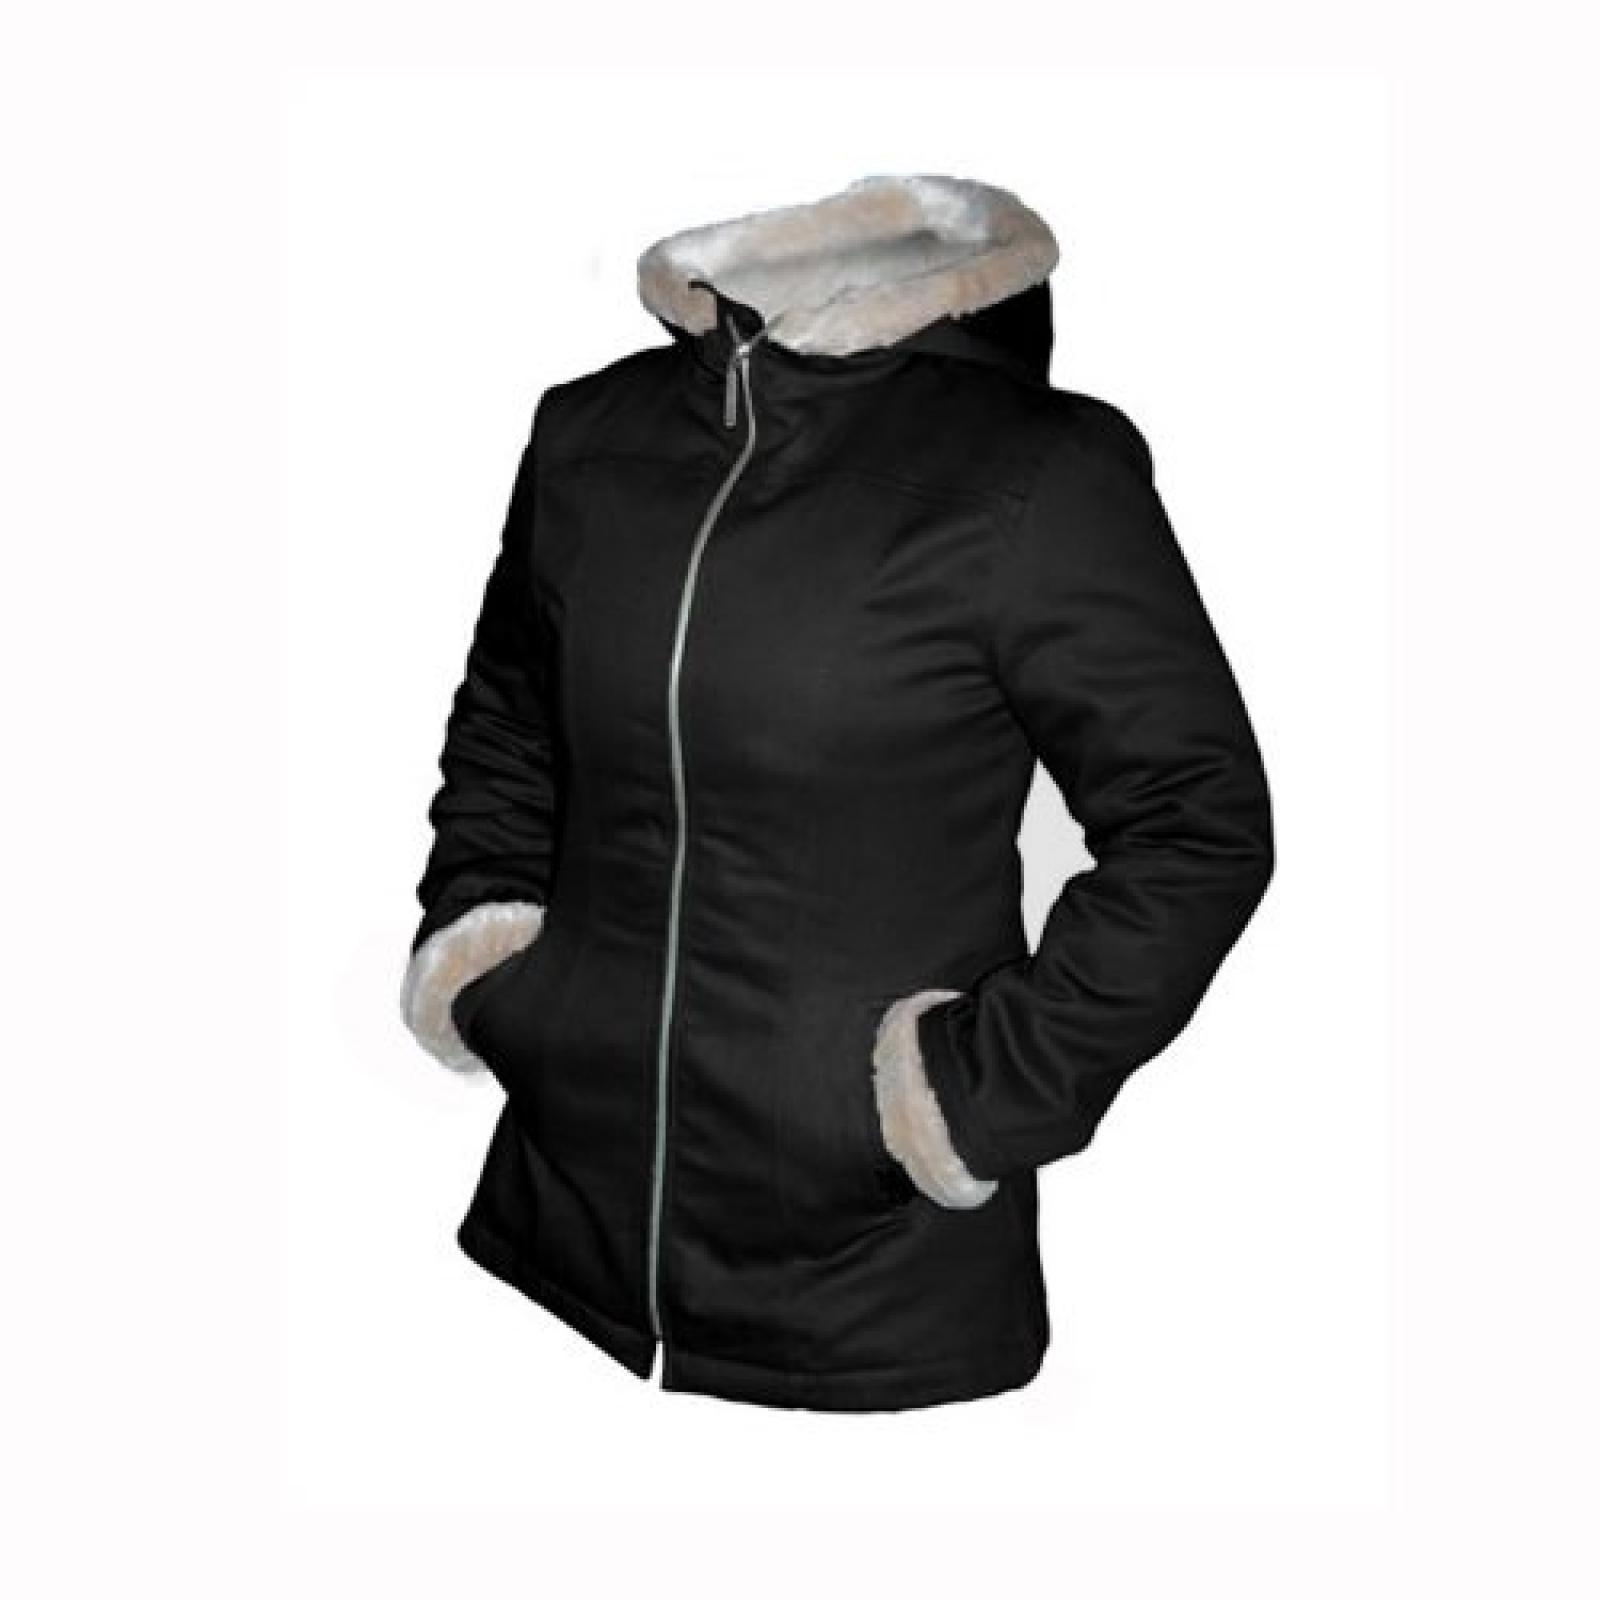 Hemp HoodLamb Damen Winterjacke, Farbe: Schwarz